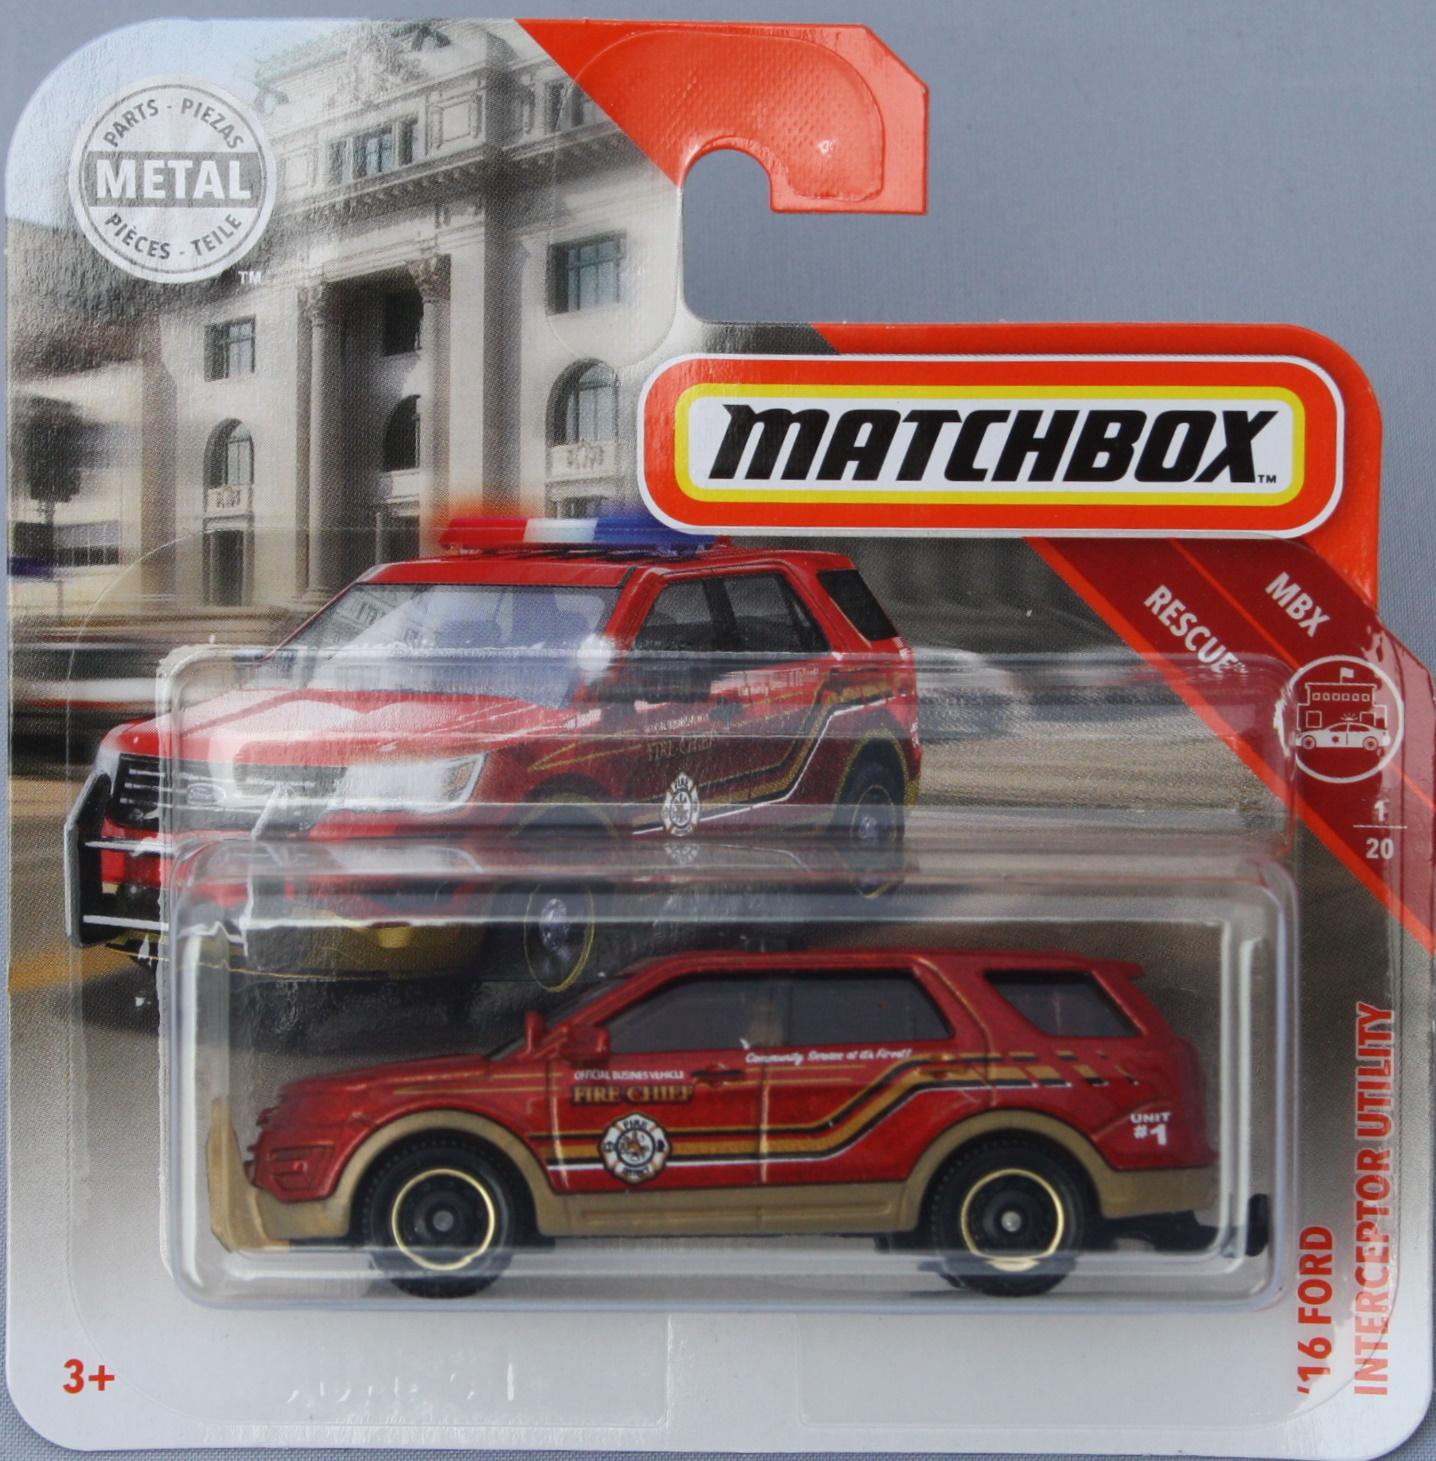 Matchbox Ford 16 Interceptor Utility - red 1:64